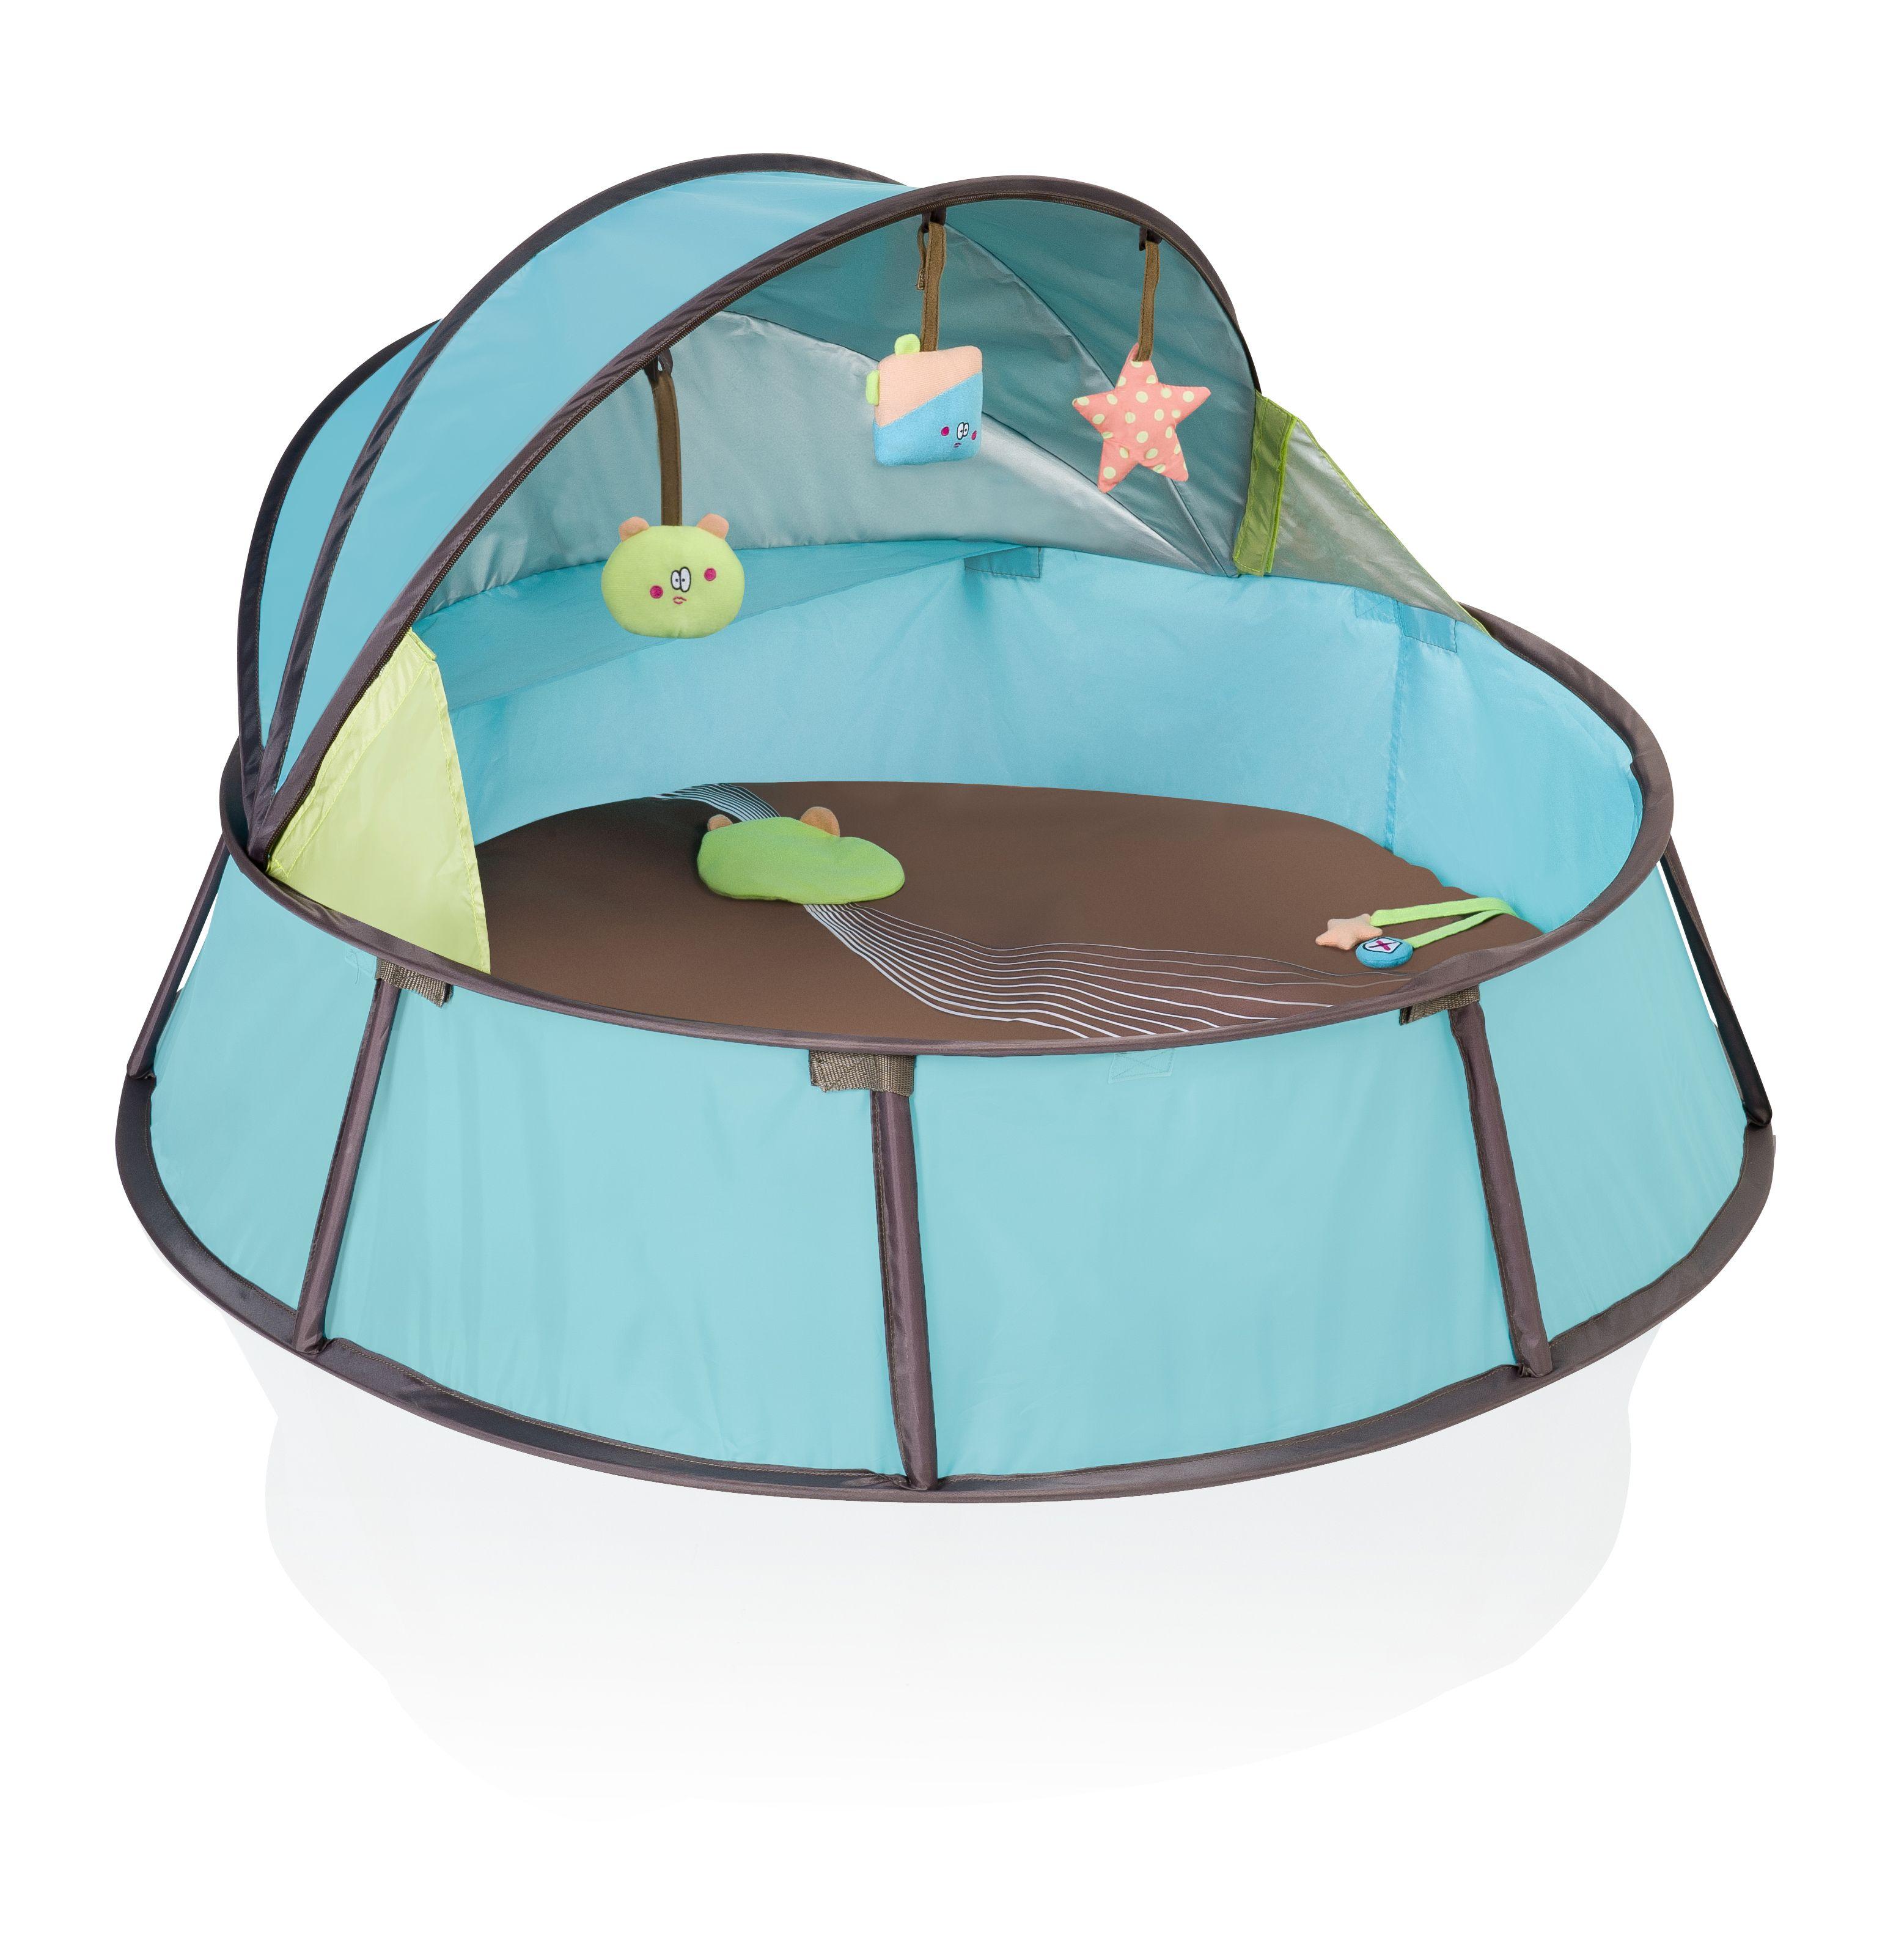 Babyni Baby playpen, Baby tent, Baby activity gym